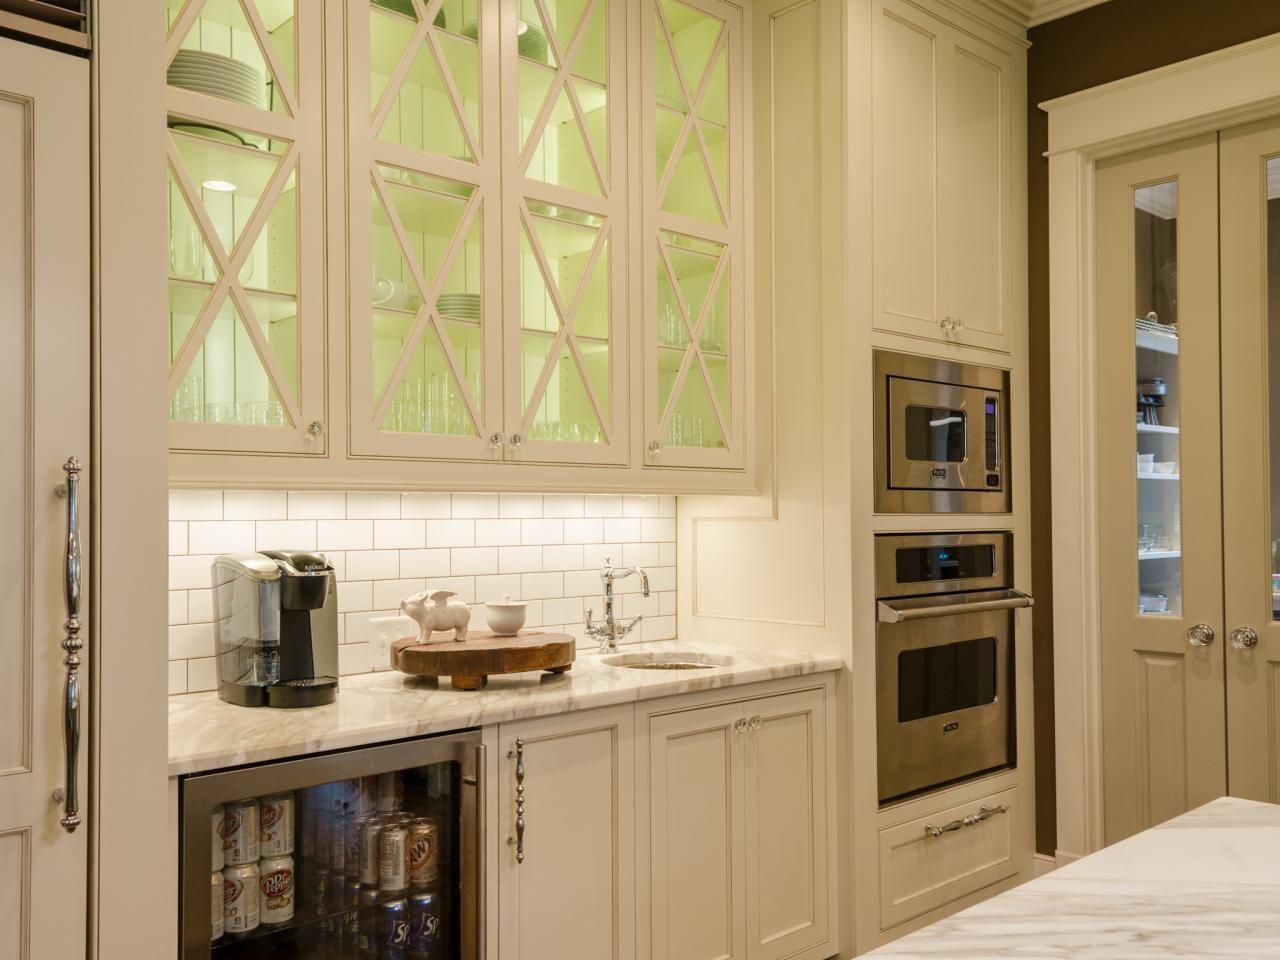 Kitchen remodeling basics kitchens diy network and pantry